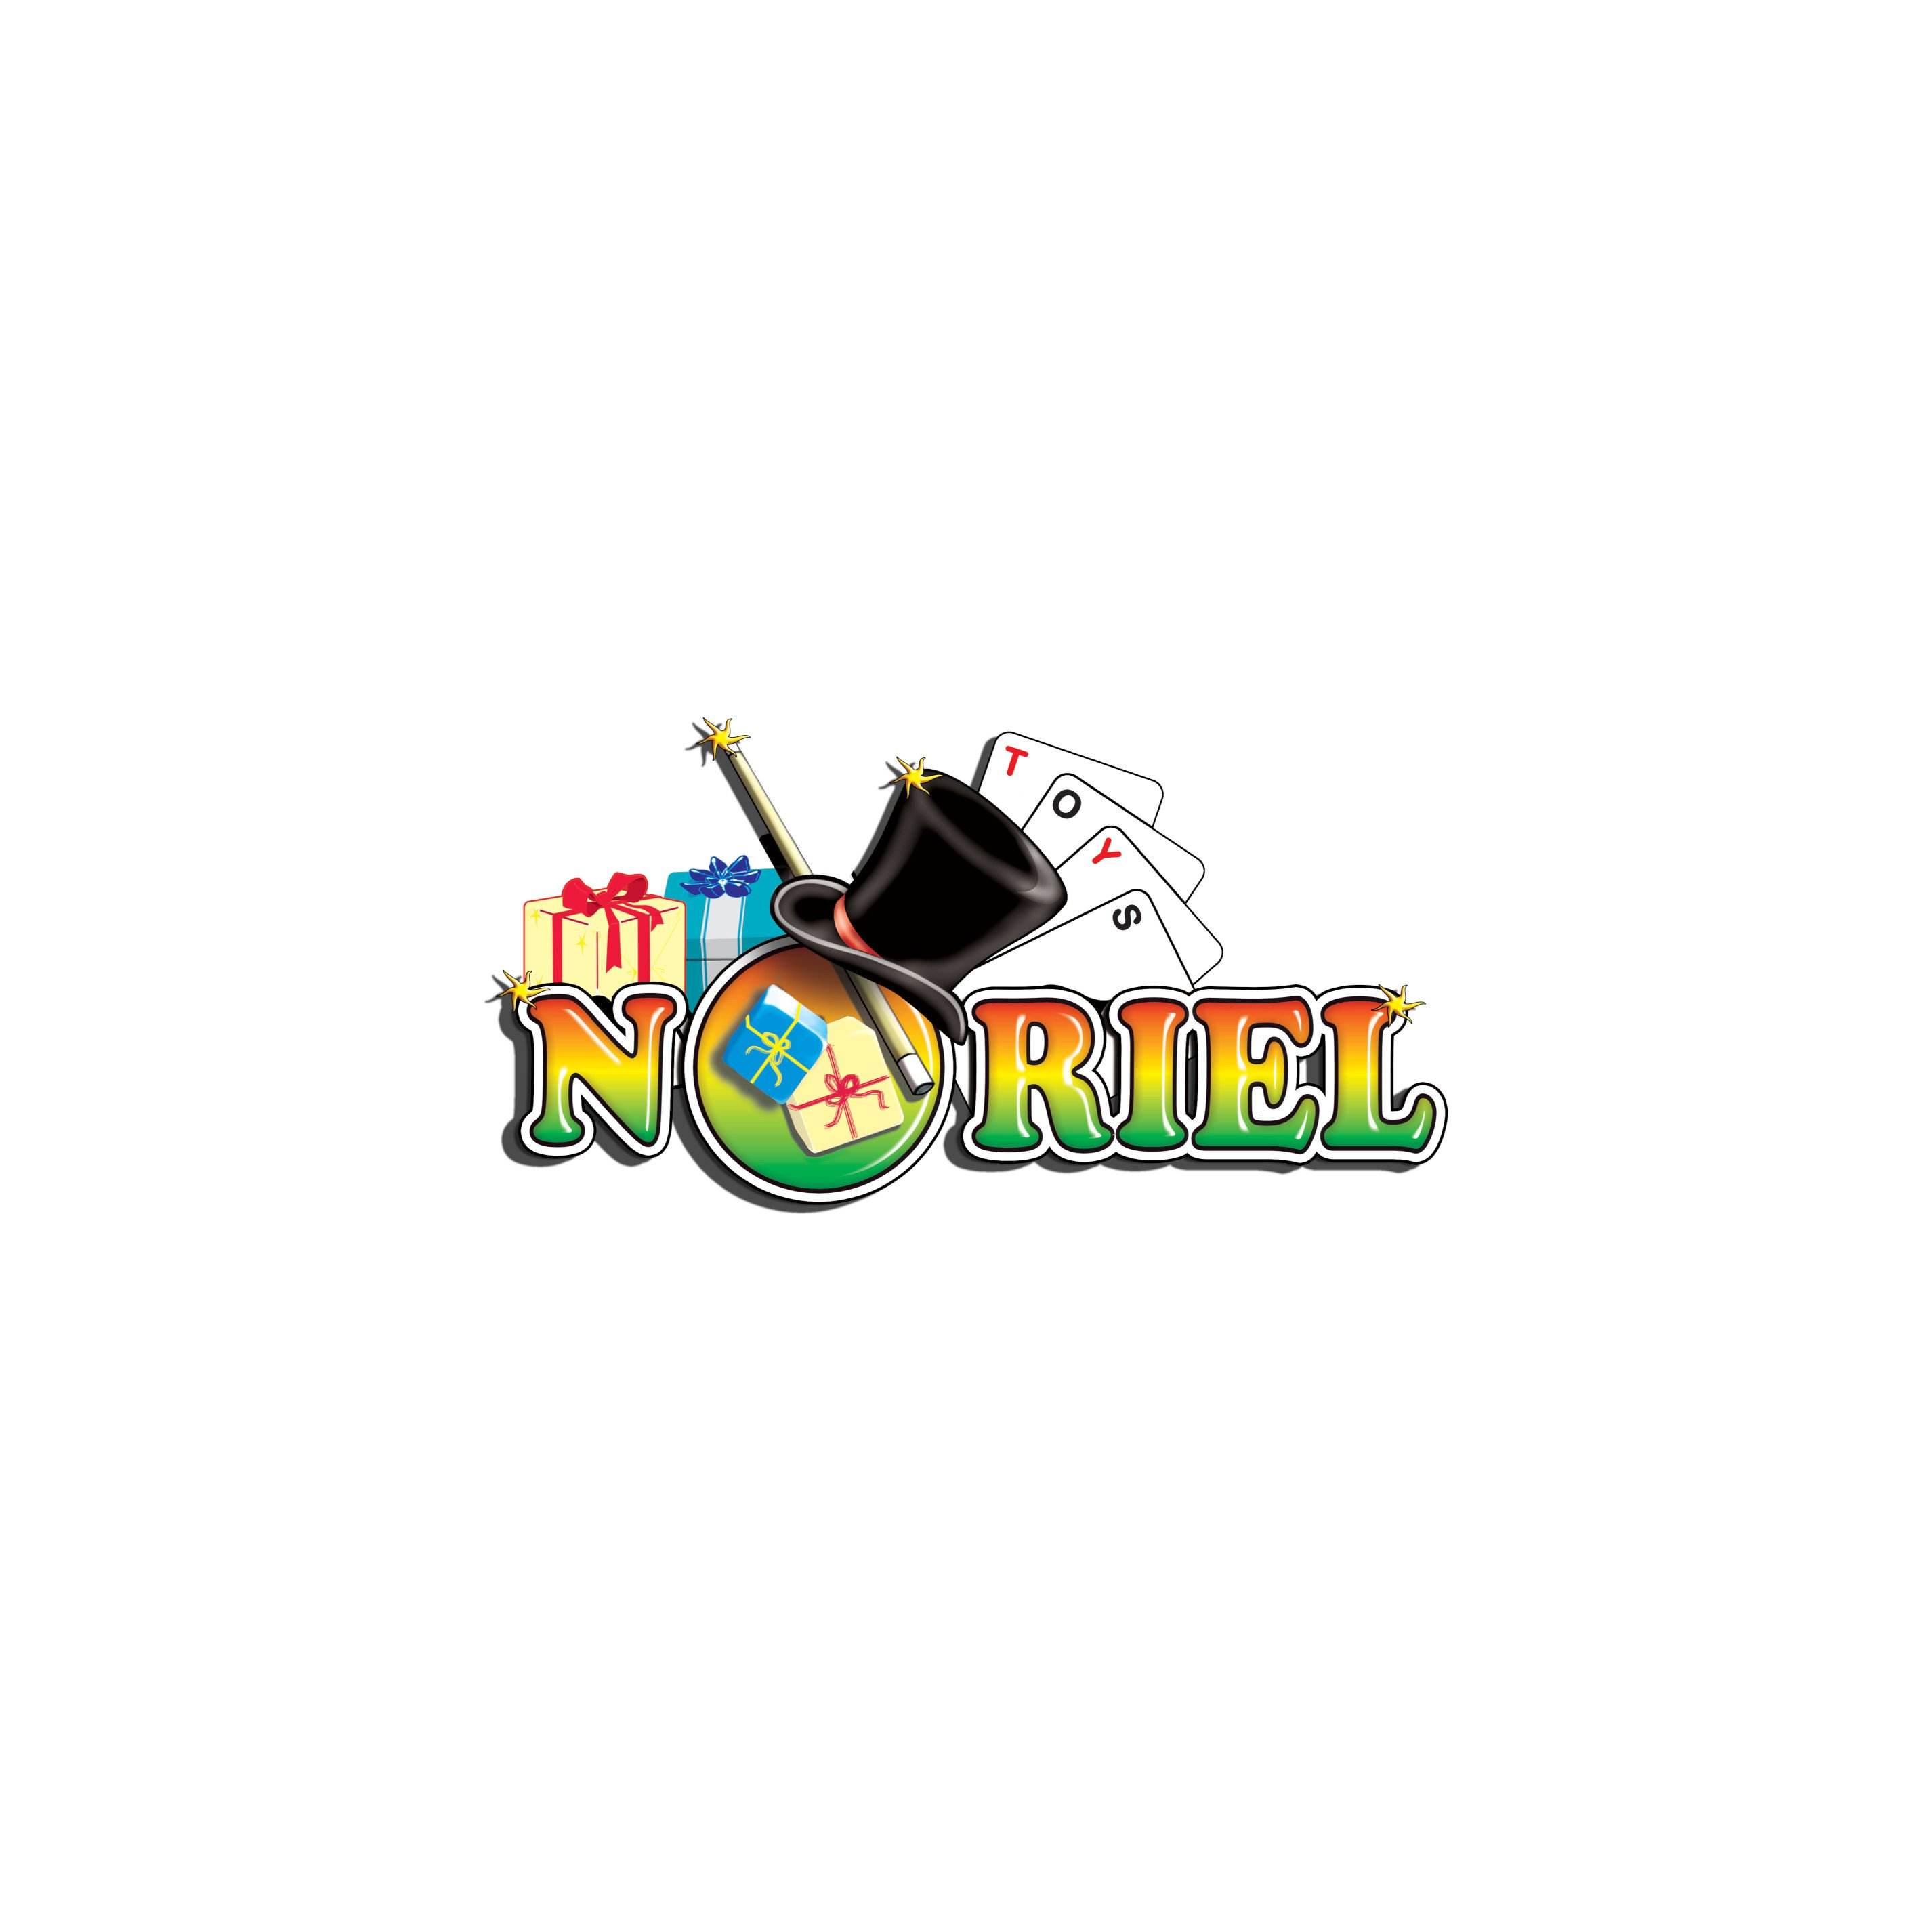 Jucarie convertibila Morphers Pocket - Cifra 5, Tun